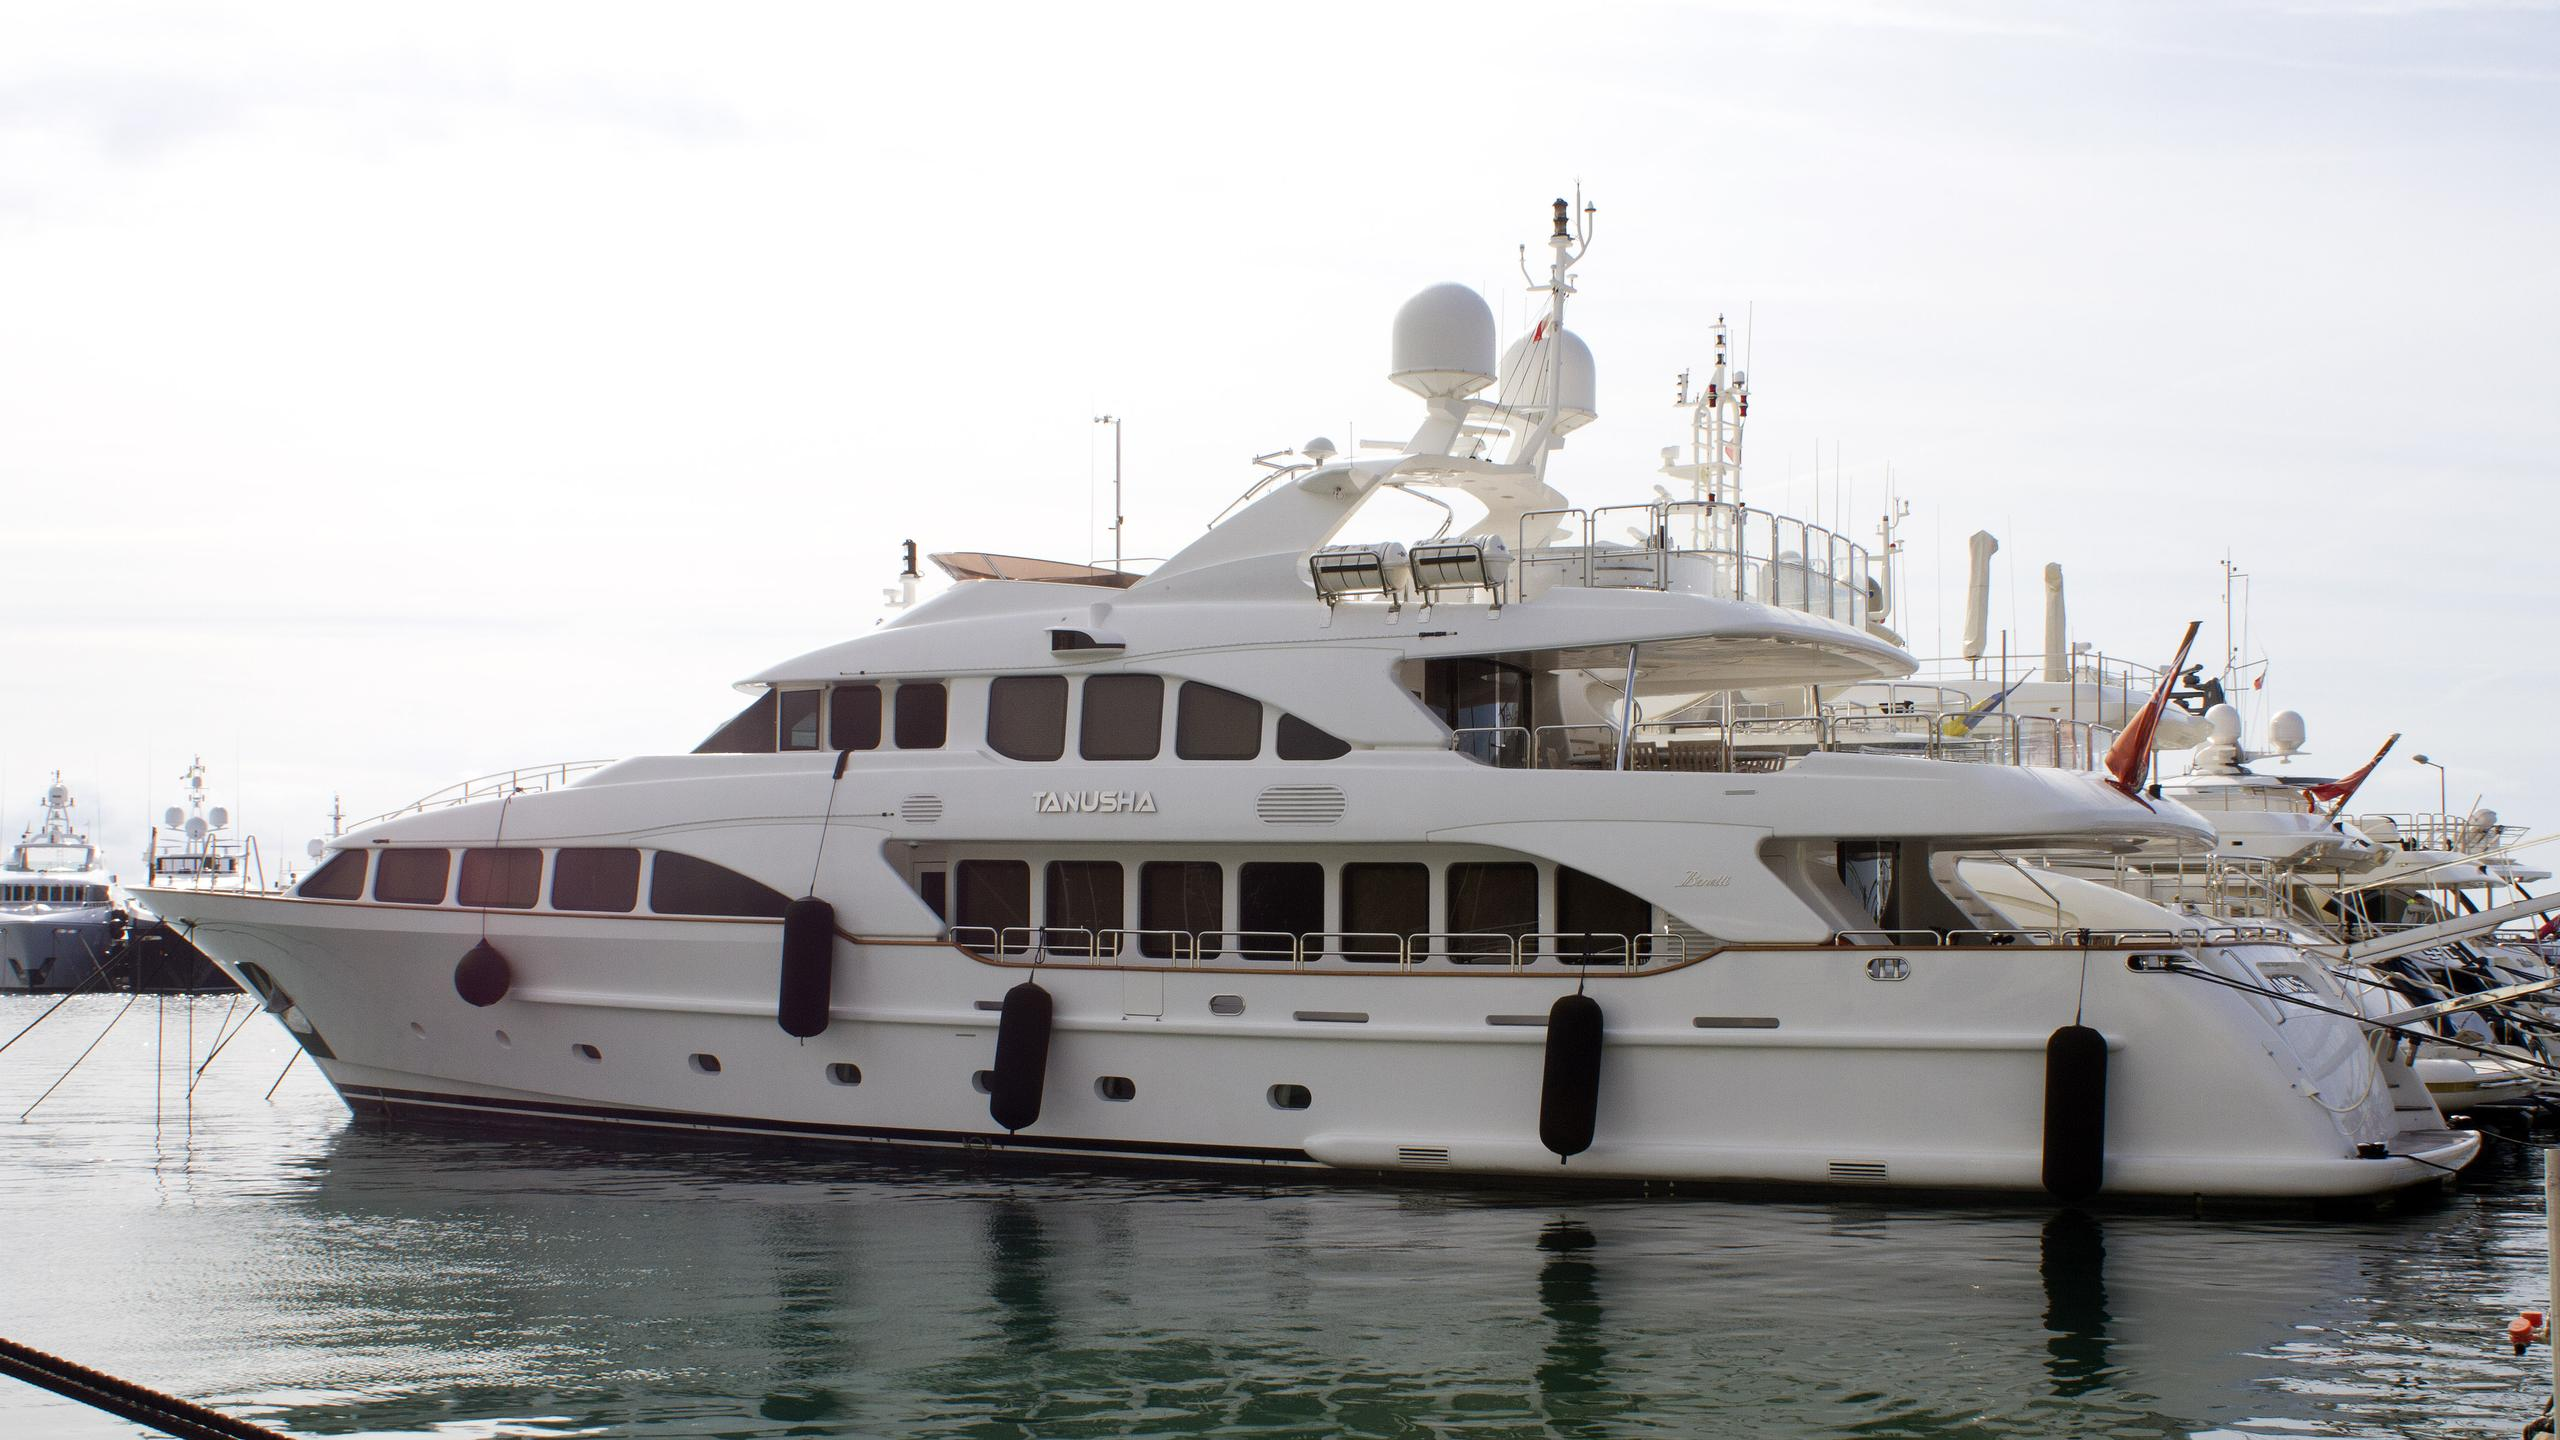 tanusha-motor-yacht-benetti-classic-120-2010-37m-half-profile